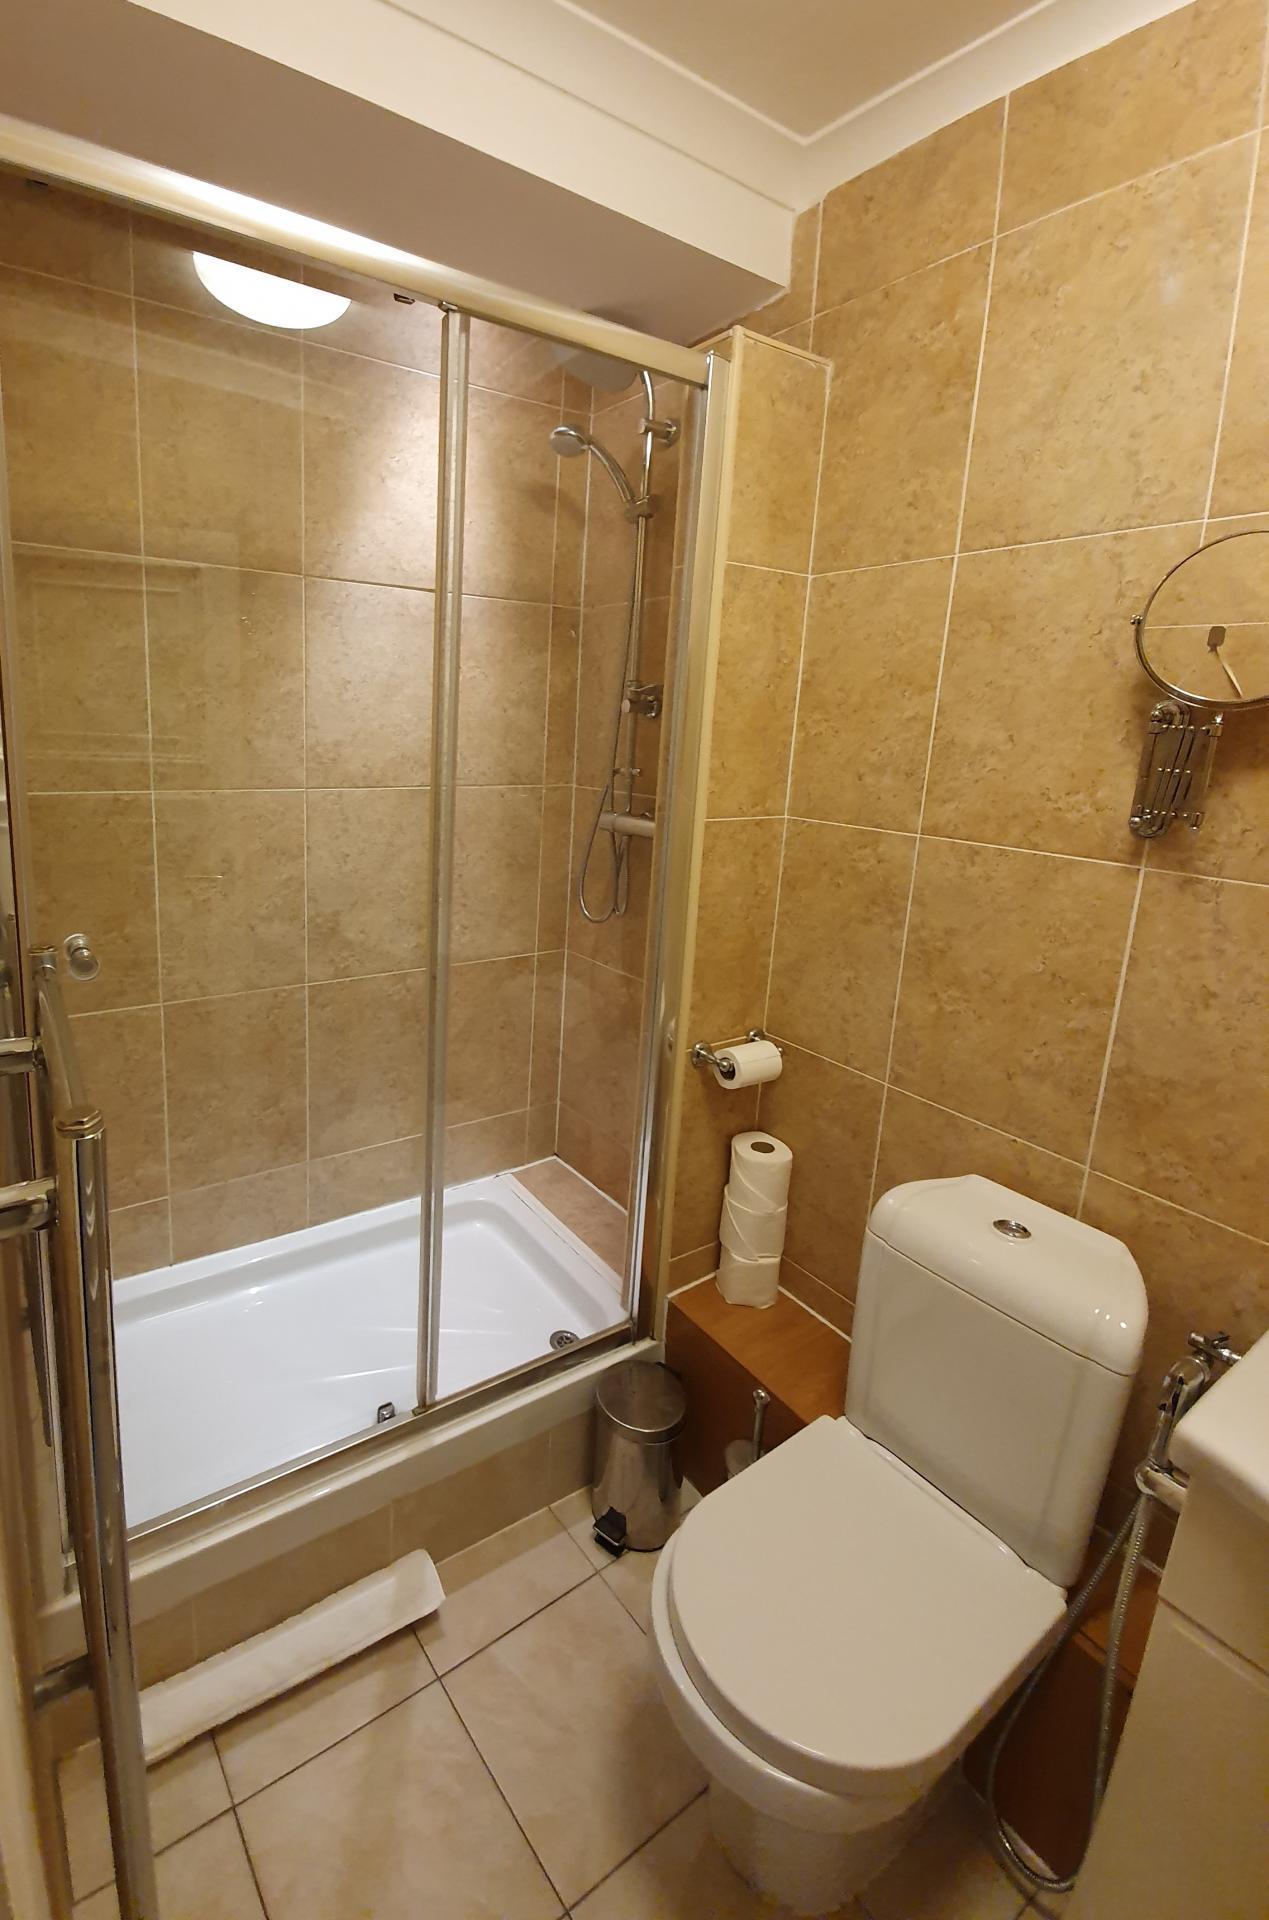 Shower at Marylebone Serviced Apartments, Marylebone, London - Citybase Apartments